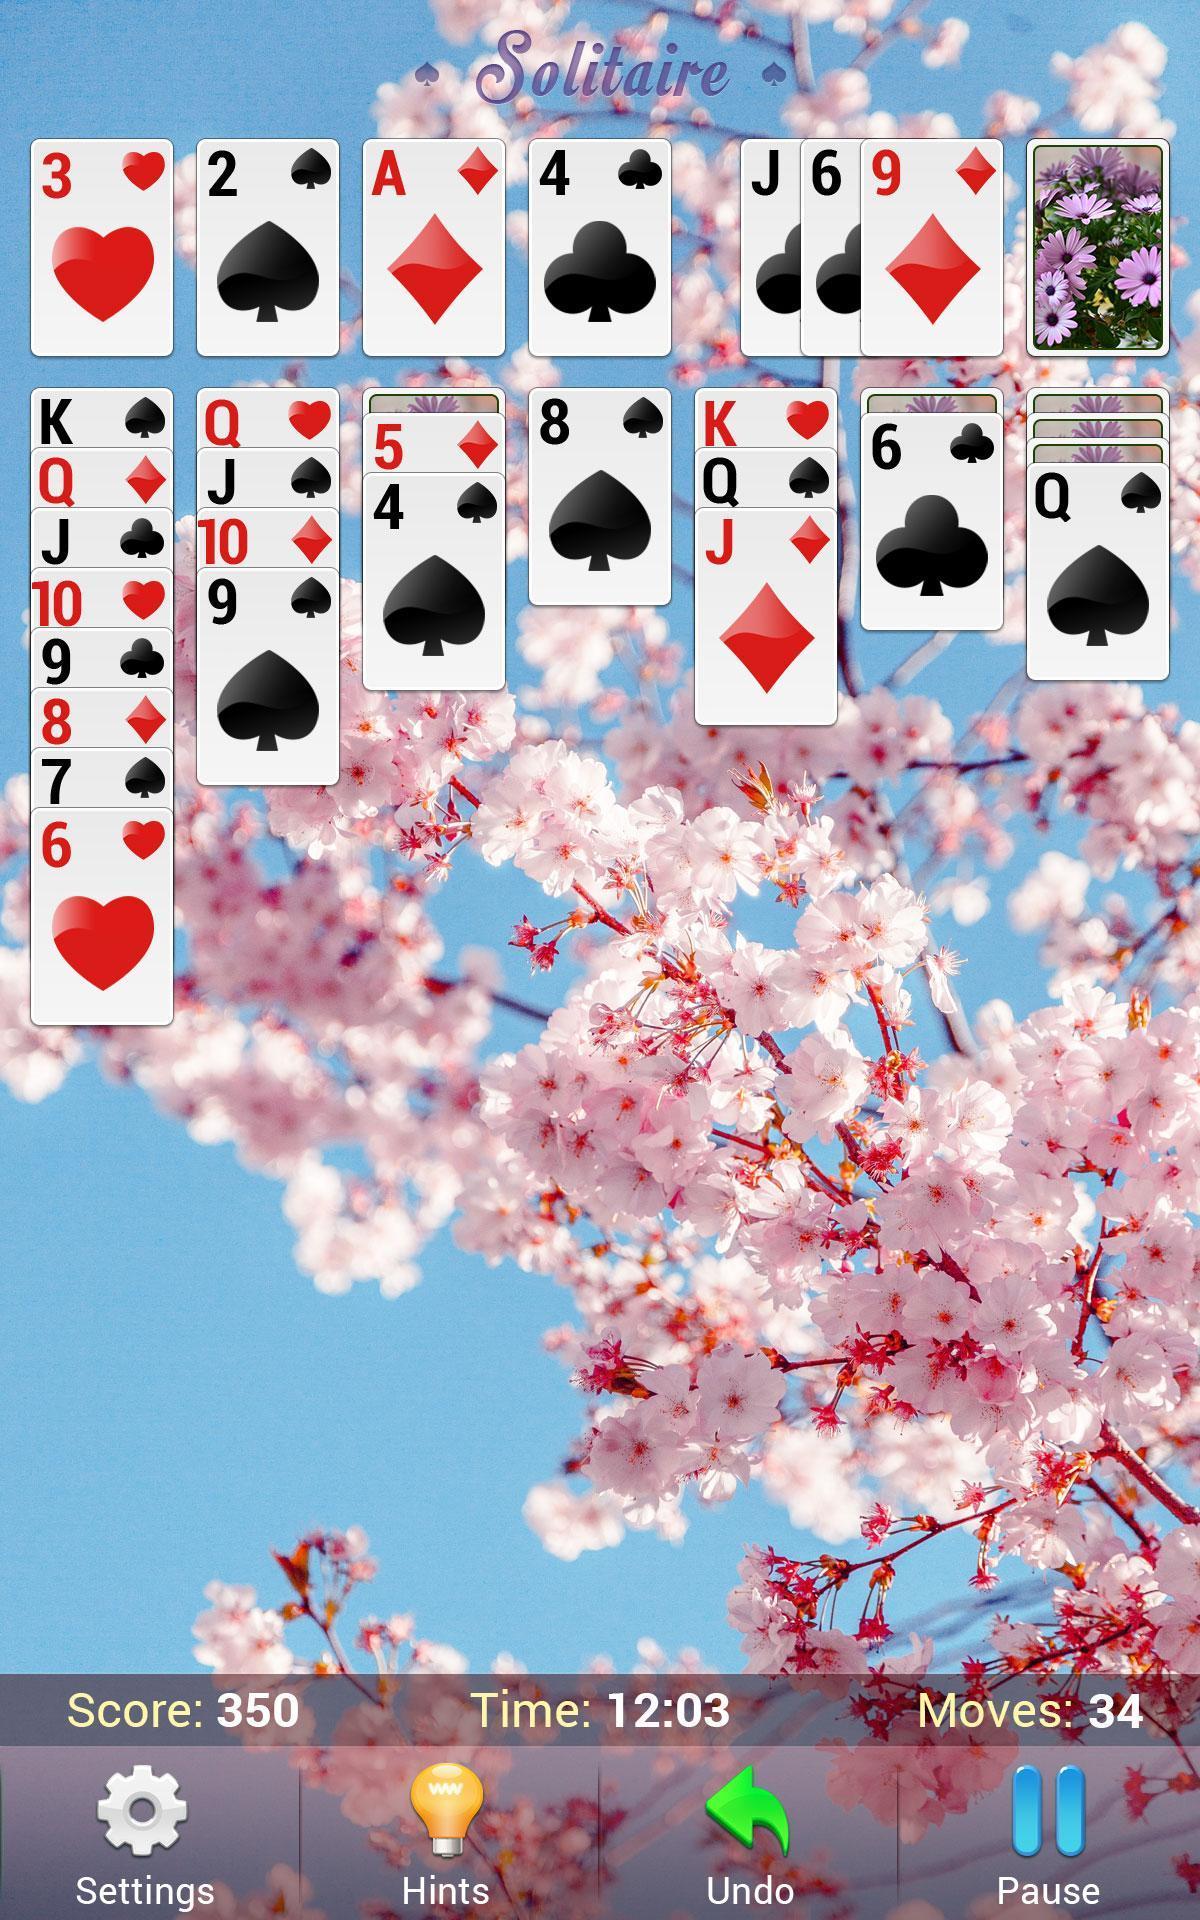 Solitaire Classic Klondike Solitaire Card Game 1.0.27 Screenshot 12